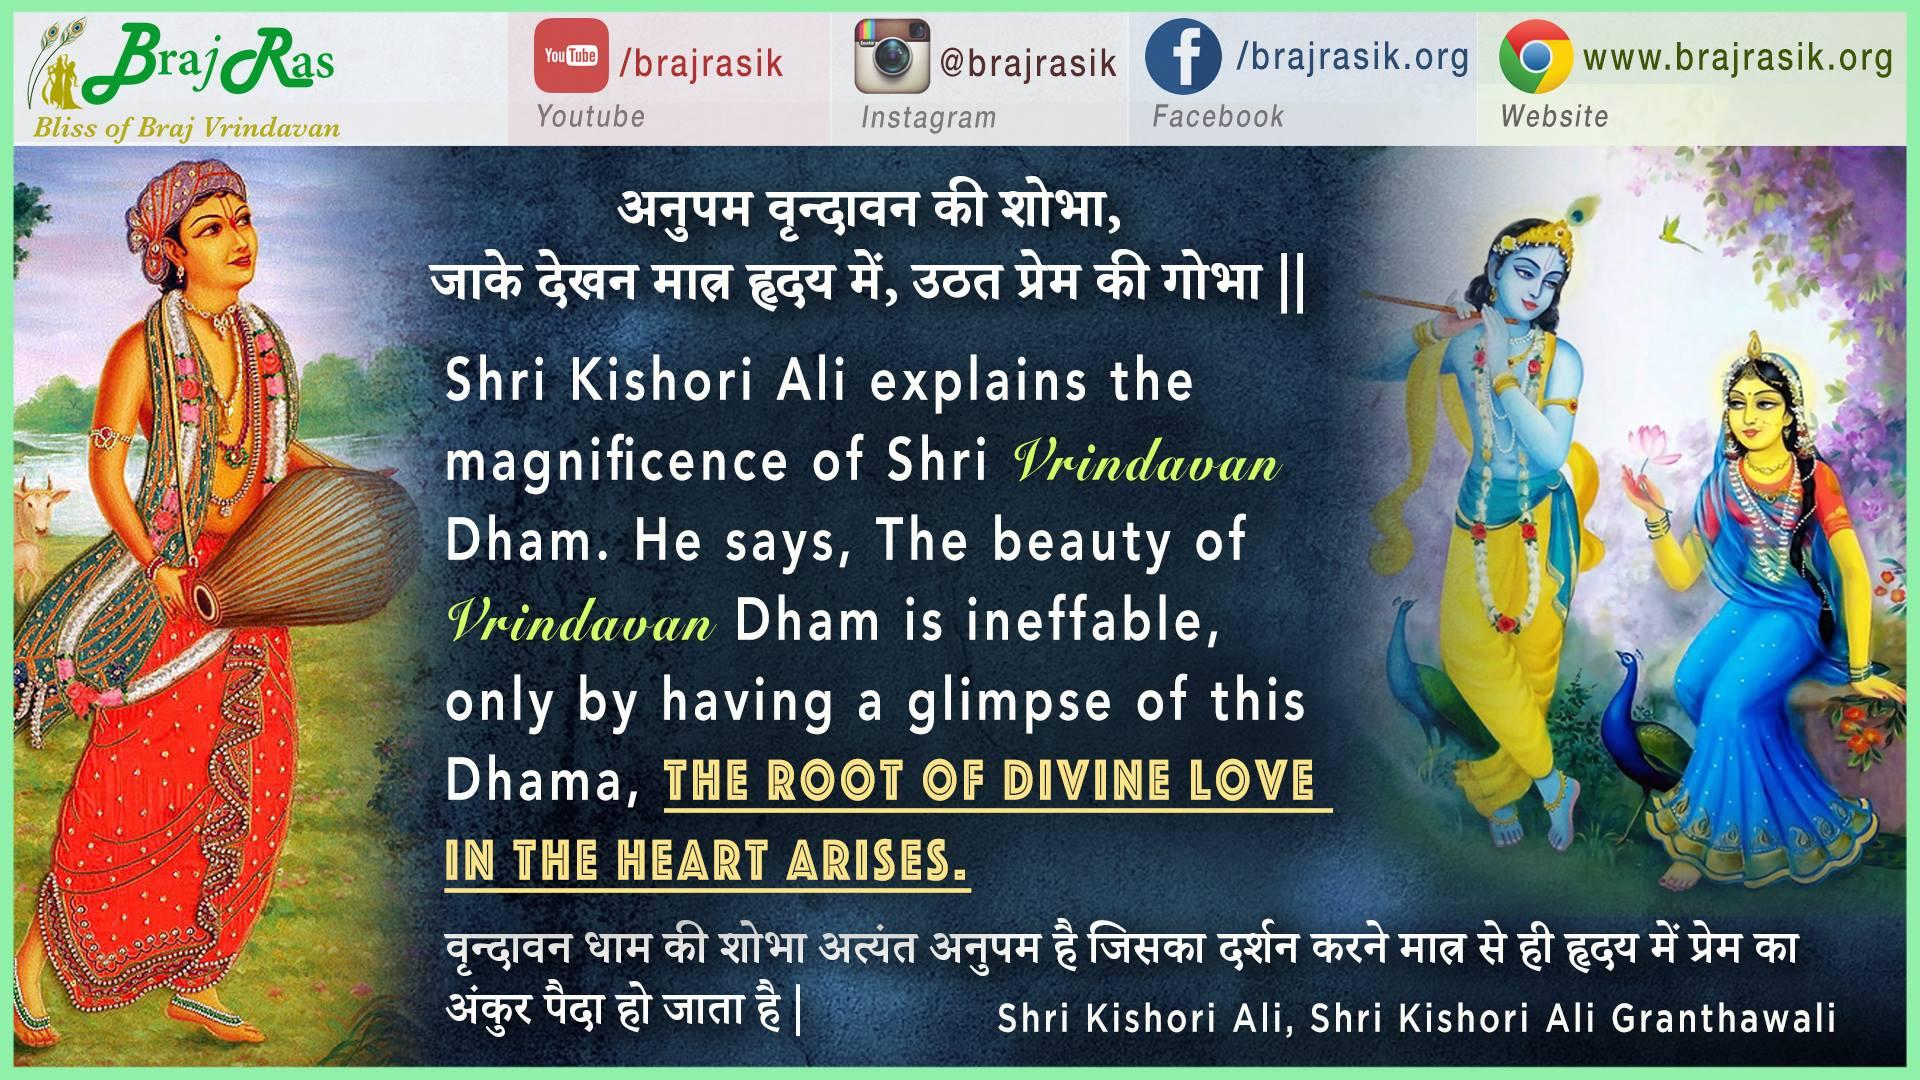 Anupam Vrindavan Ki Shobha -  Shri Kishori Ali, Shri Kishori Ali Granthawali